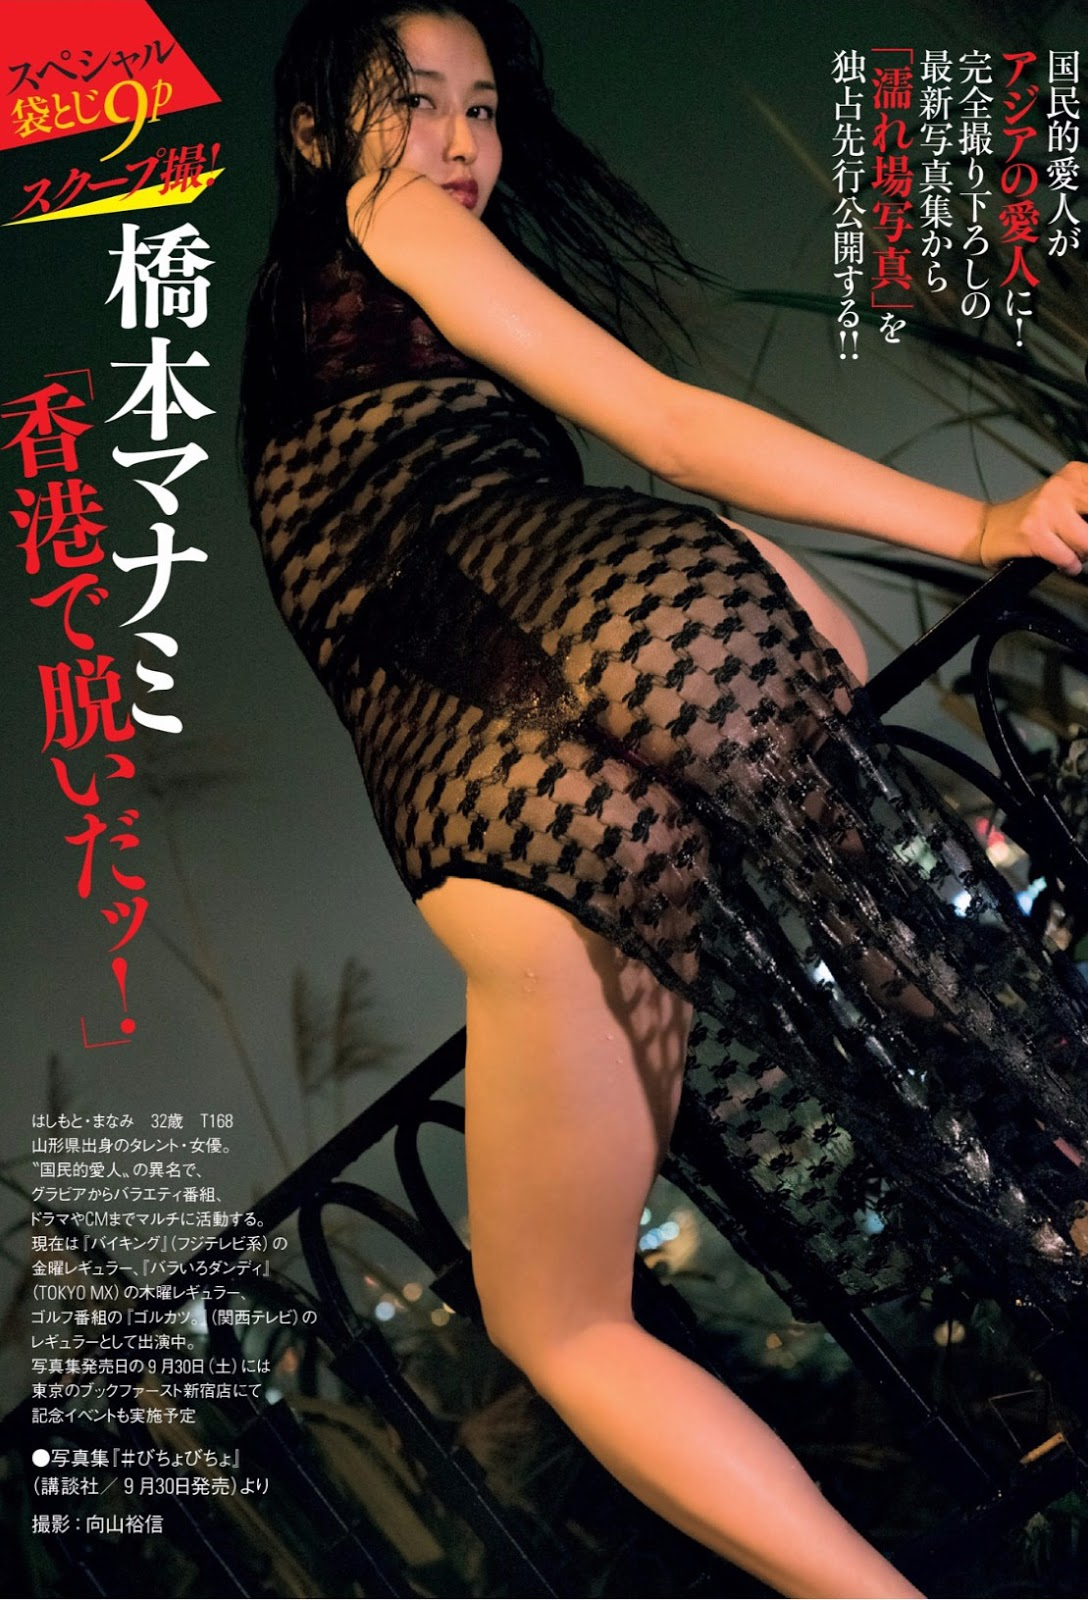 Hashimoto Manami 橋本マナミ, FRIDAY 2017.08.11 (フライデー 2017年08月11日号)